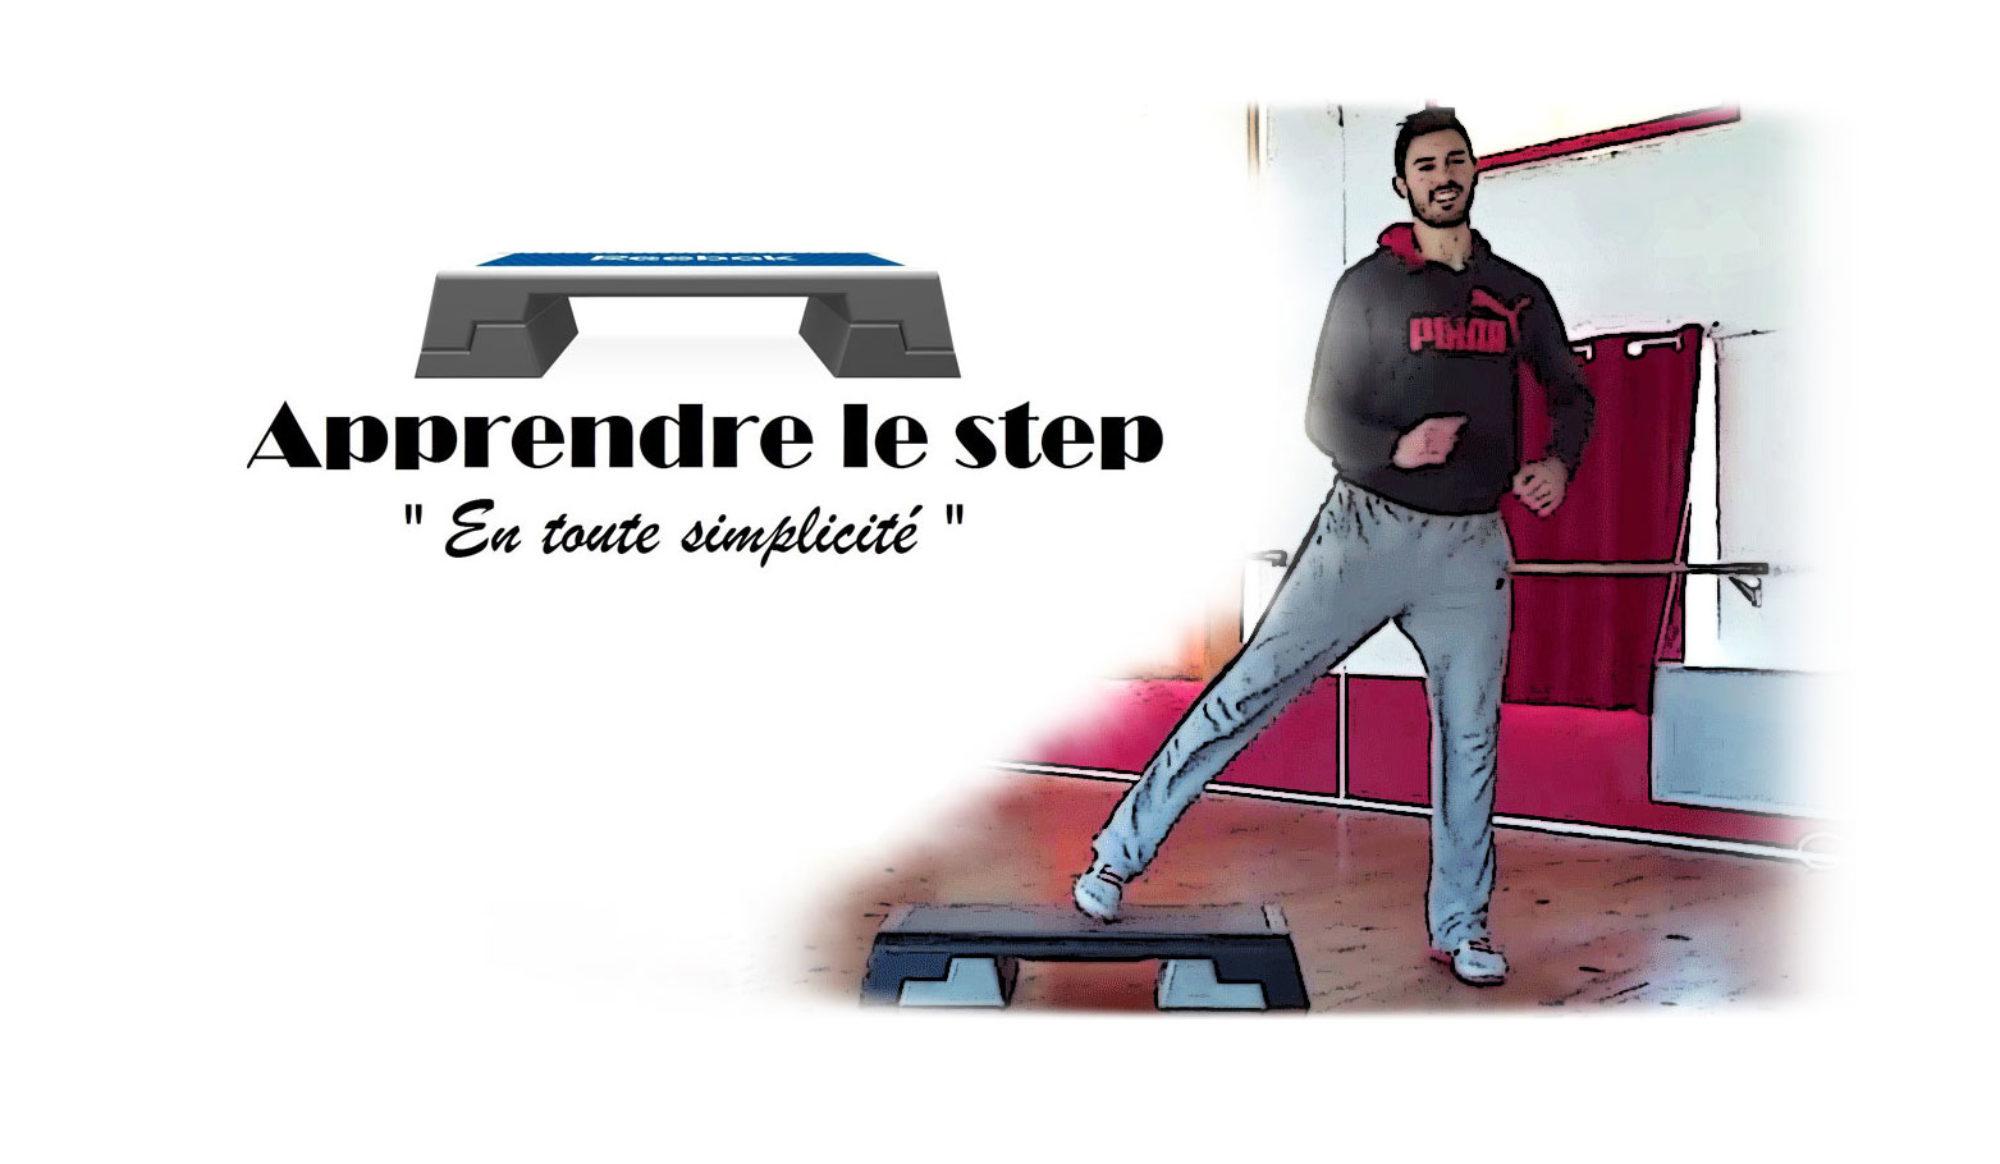 Apprendre le step